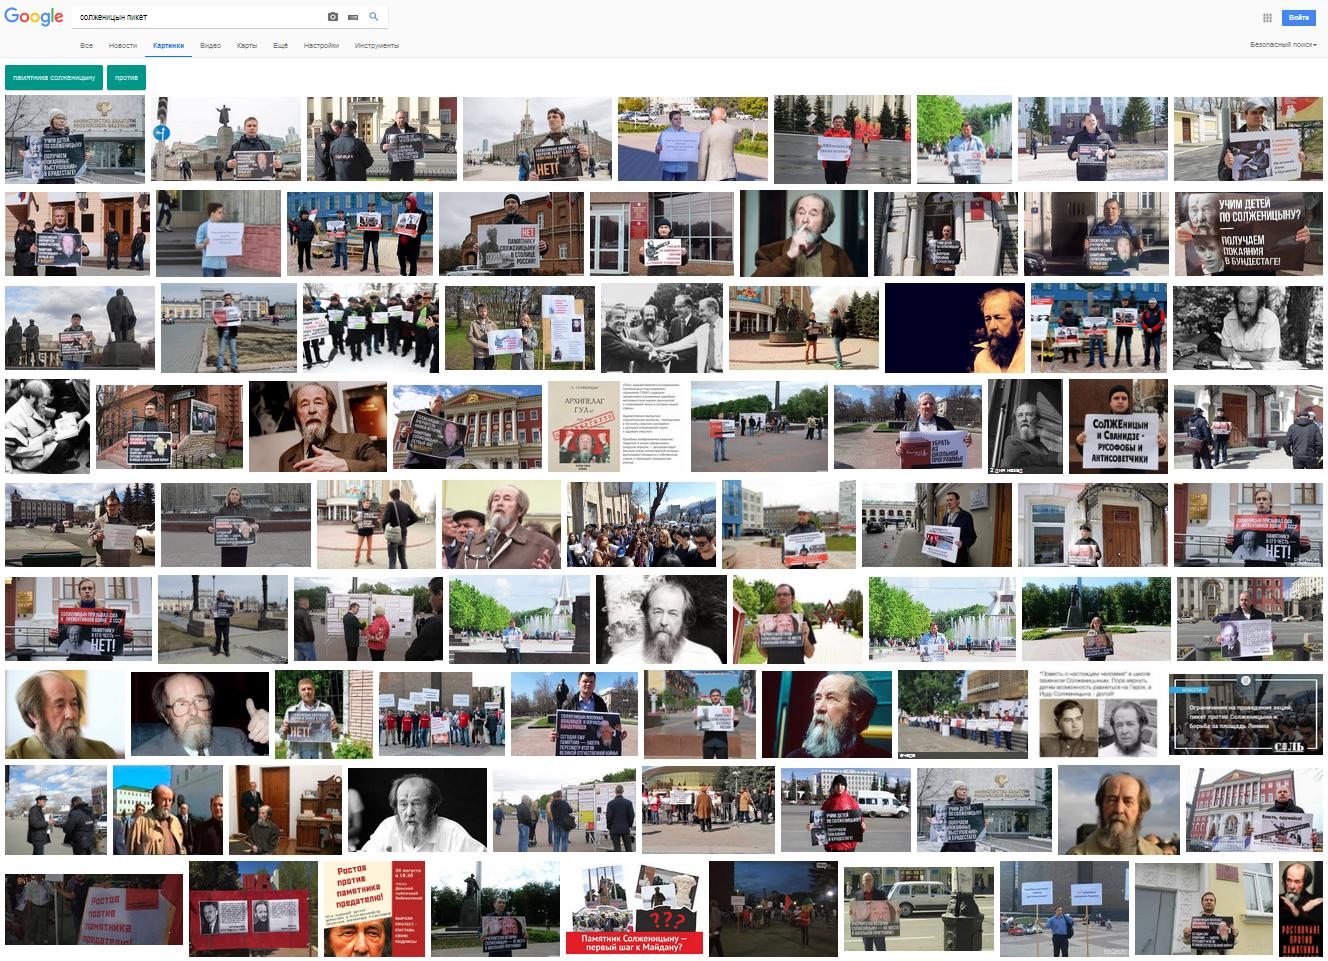 Солженицын-пикет-Google-201808_14-30